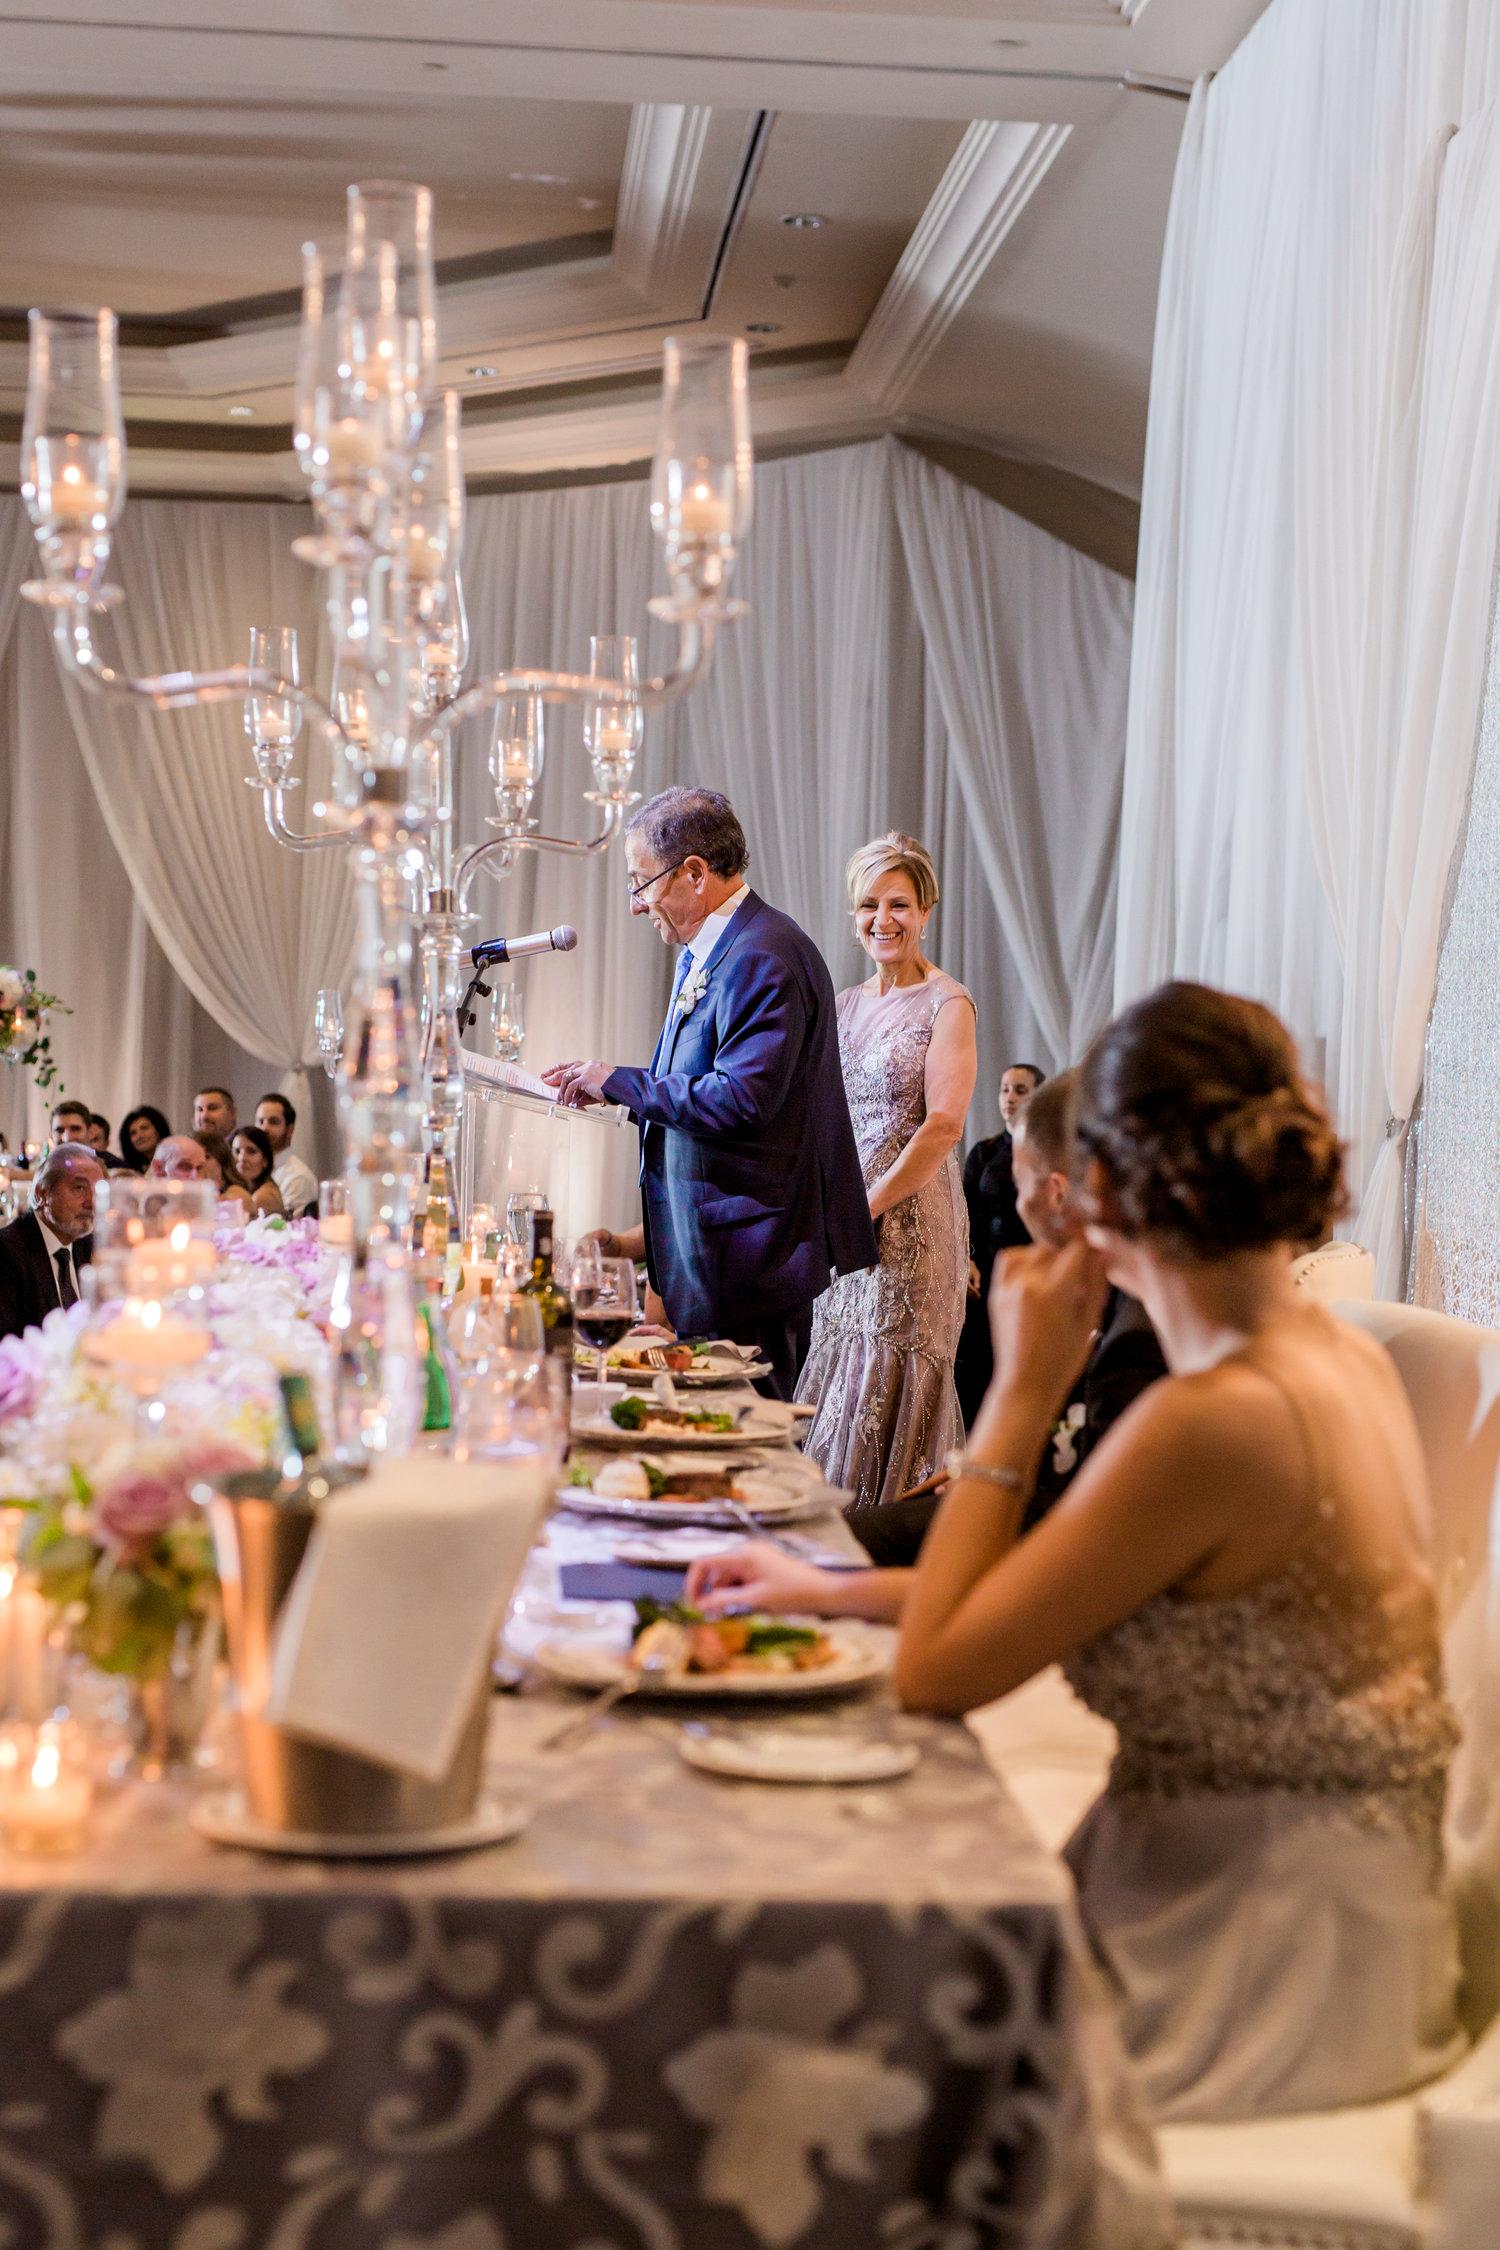 Danielle-Giroux-Amir-Golbazi-Toronto-Wedding-Photographer-Bellvue-Manor_DeLuca_2-564.jpg